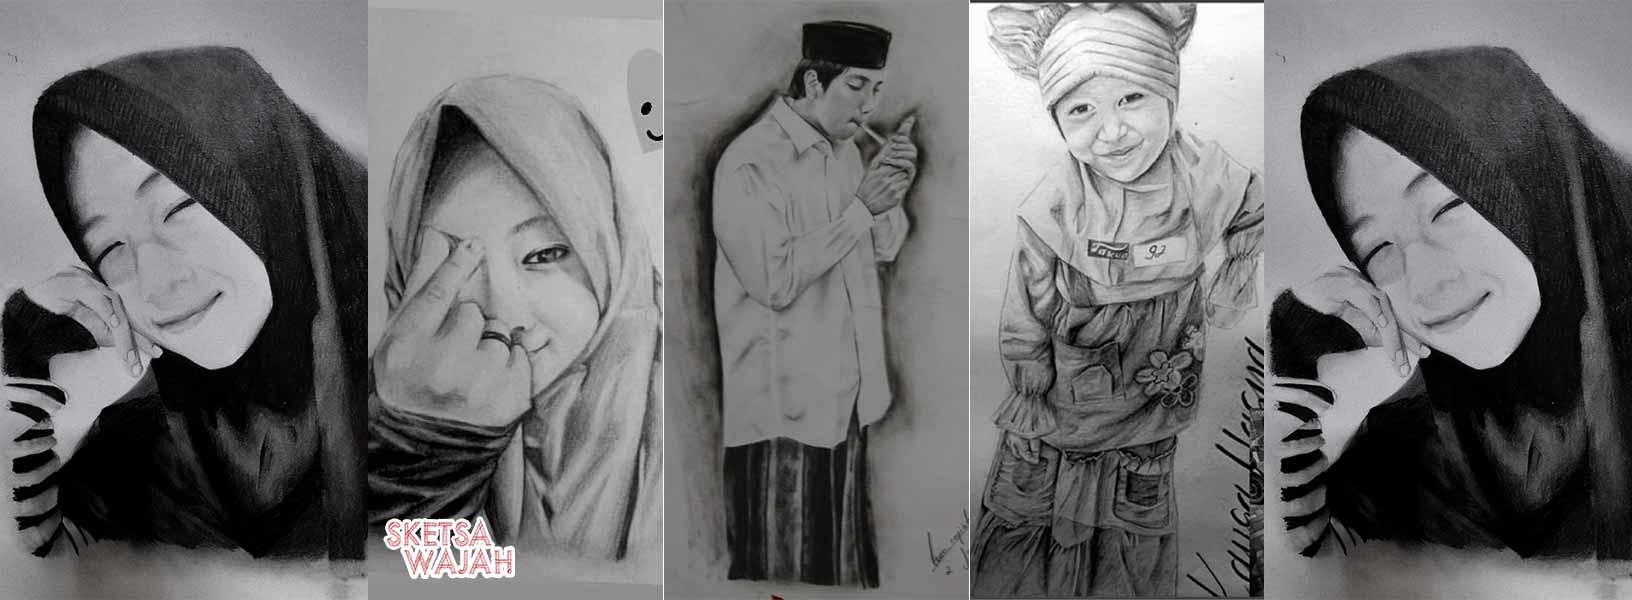 Karya Isna Rofiatul sketcher Sketsa Wajah